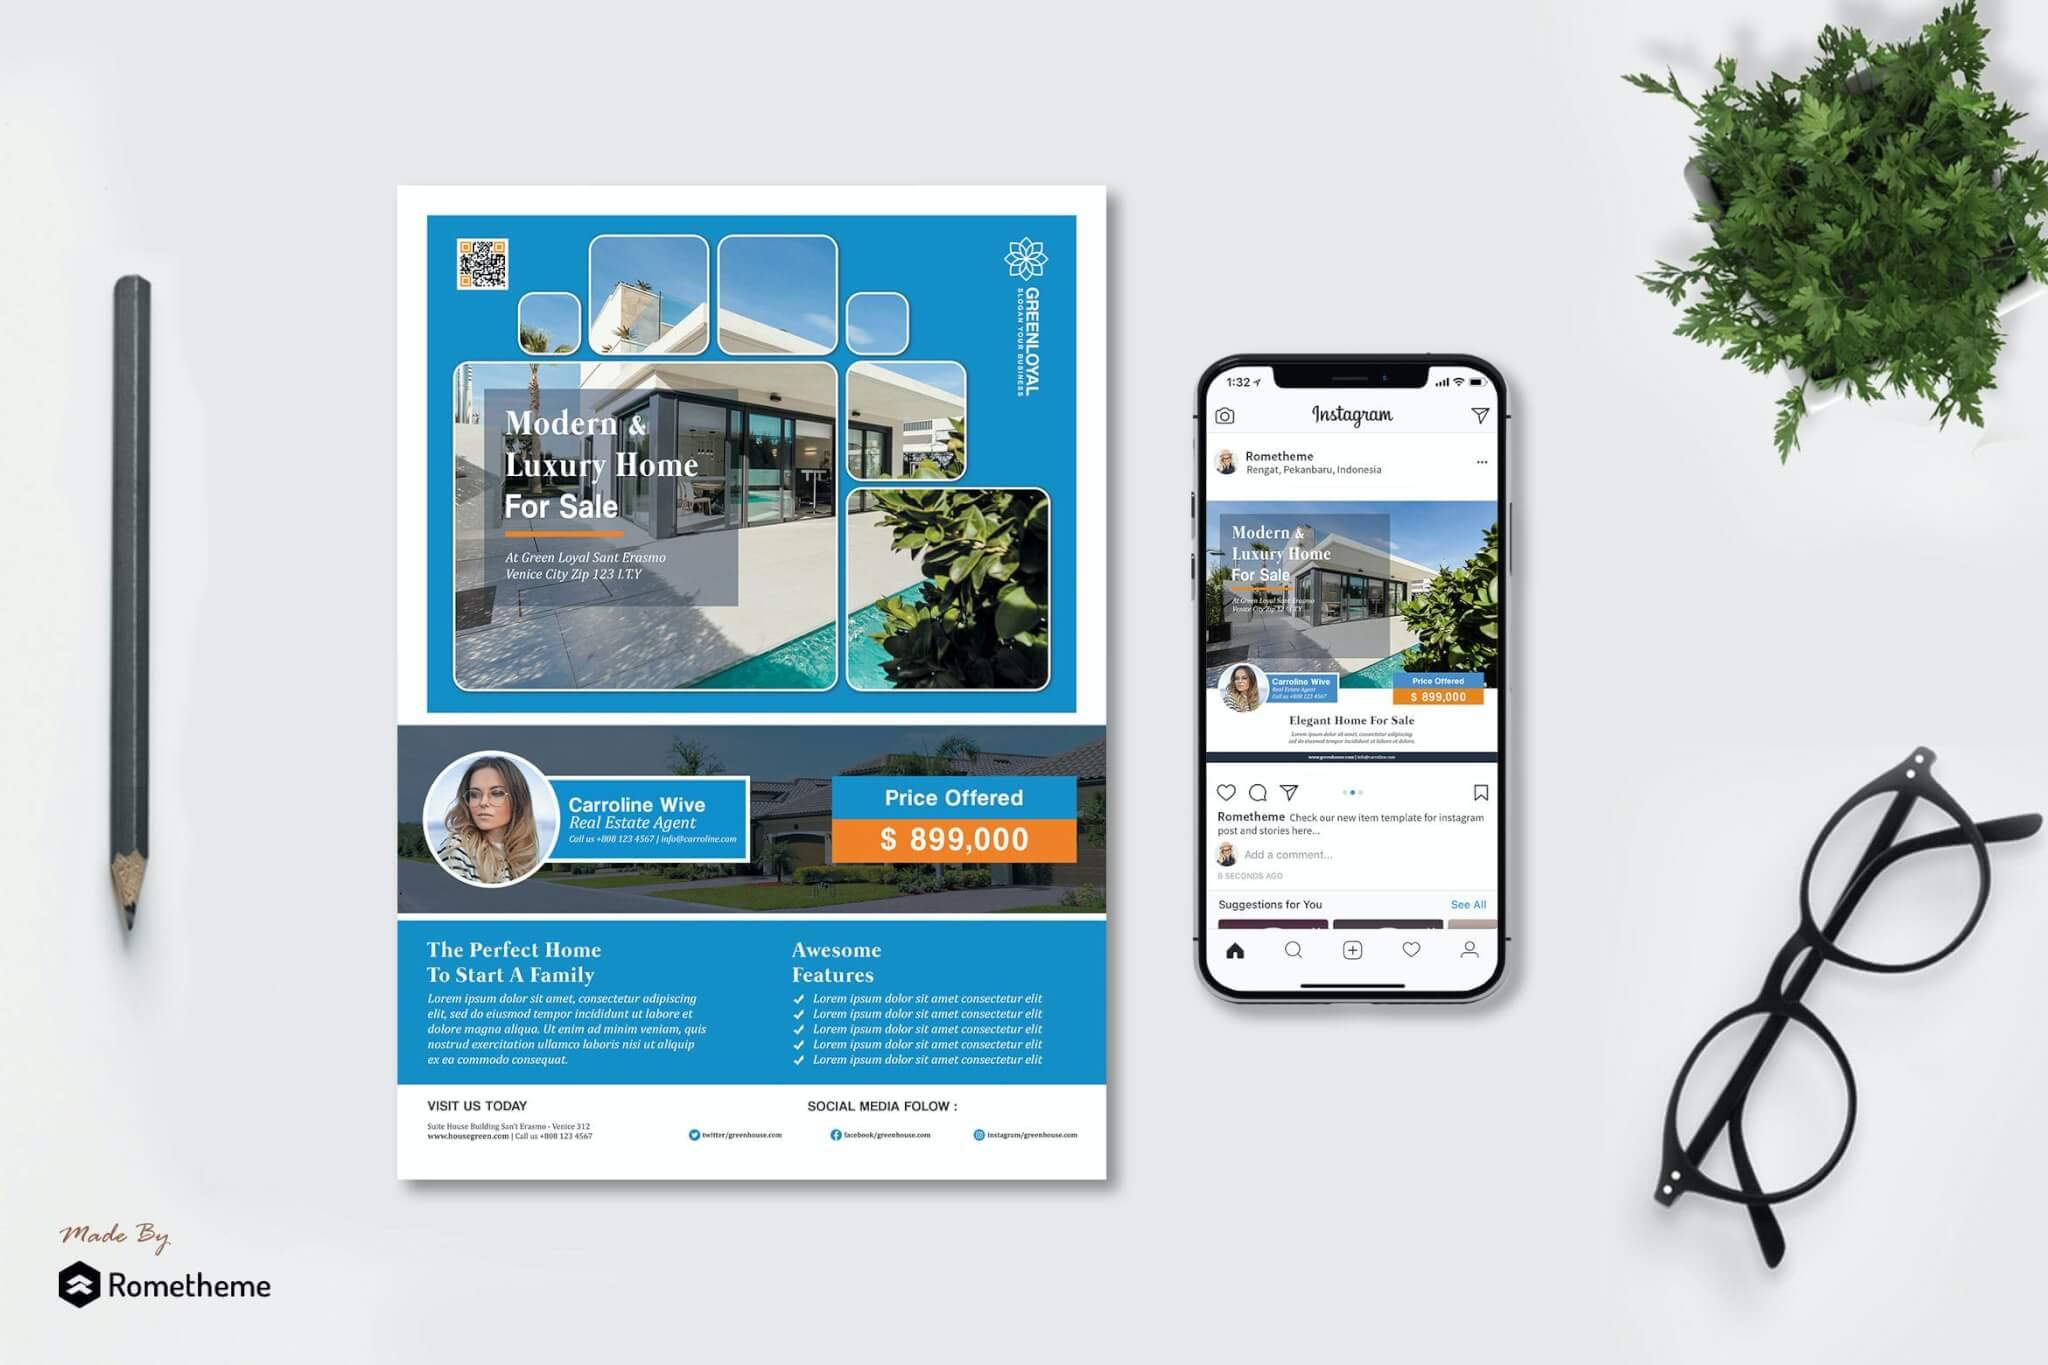 GreenLoyal-房地产海报传单设计模板